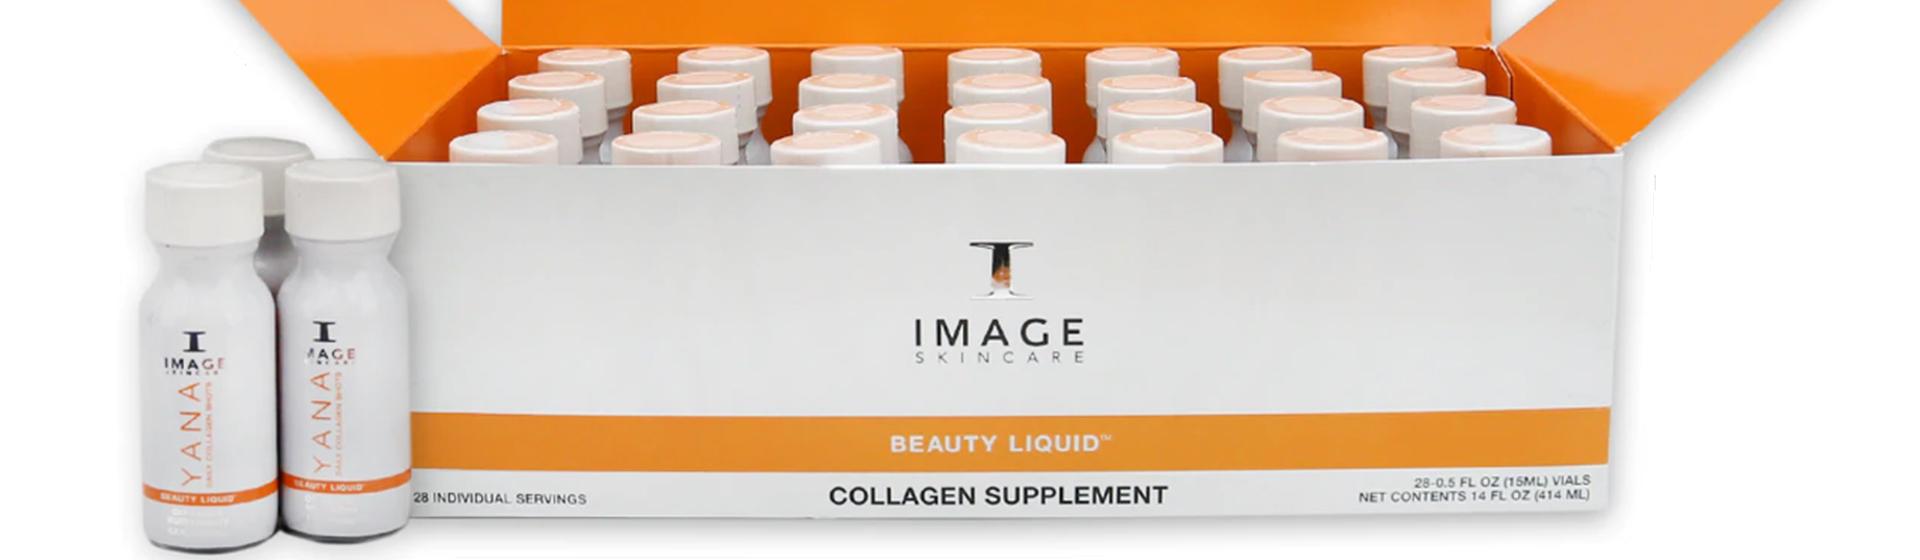 Image Skincare Collagen